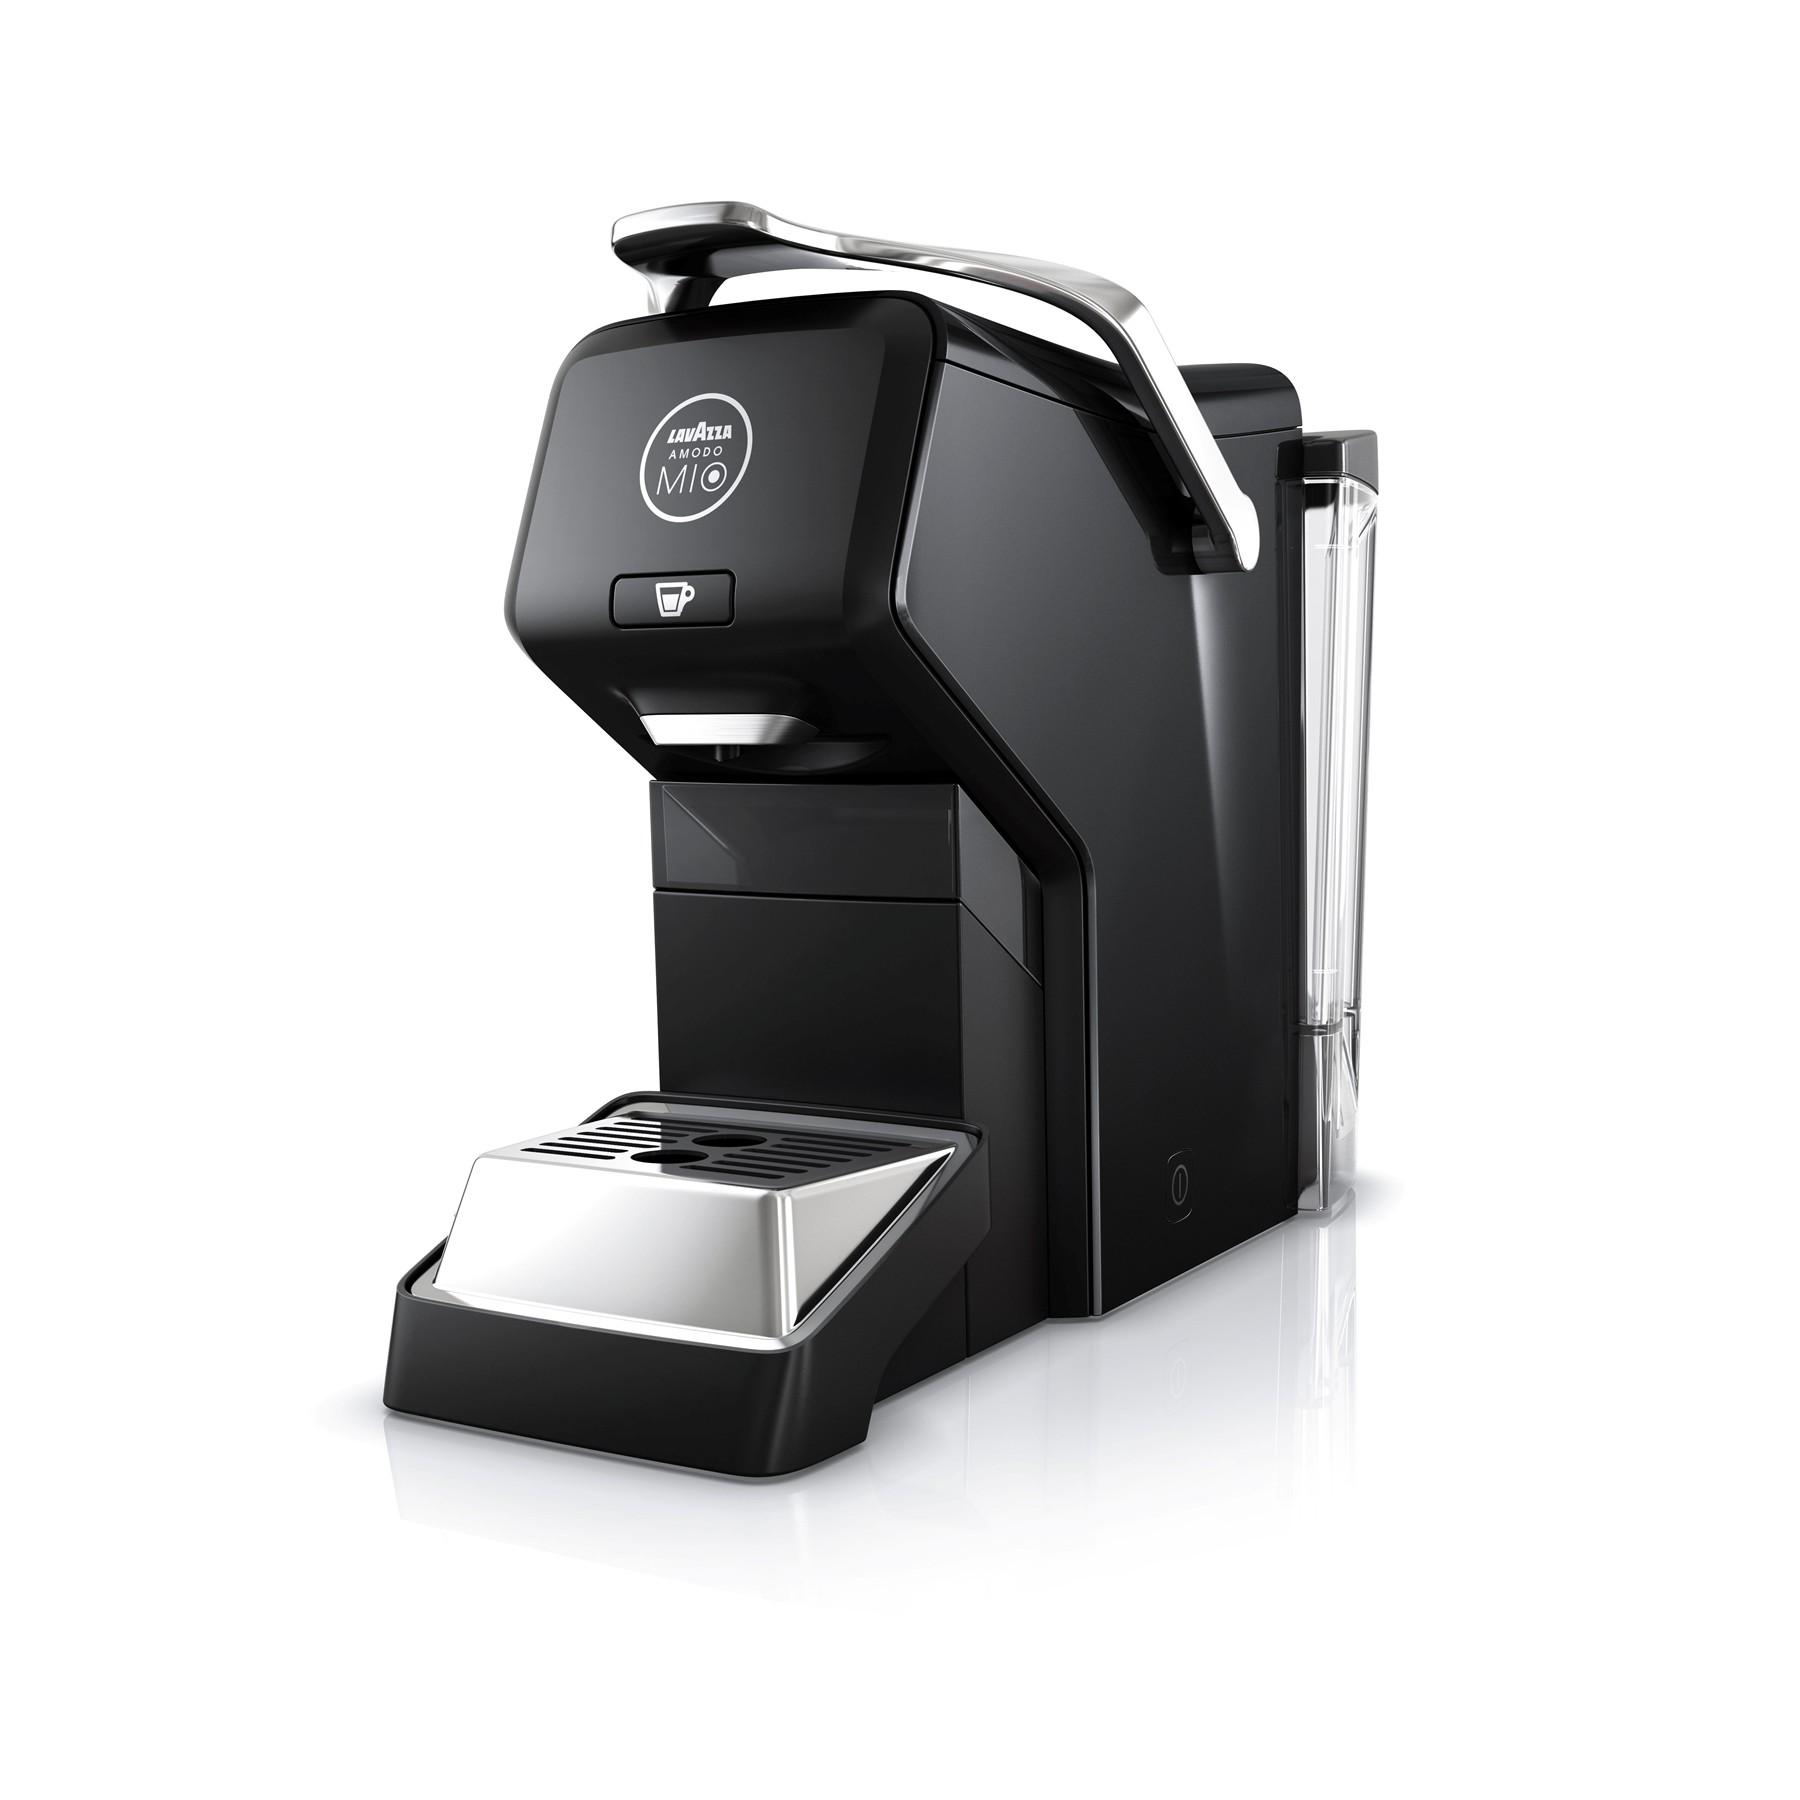 modo mio coffee machine review